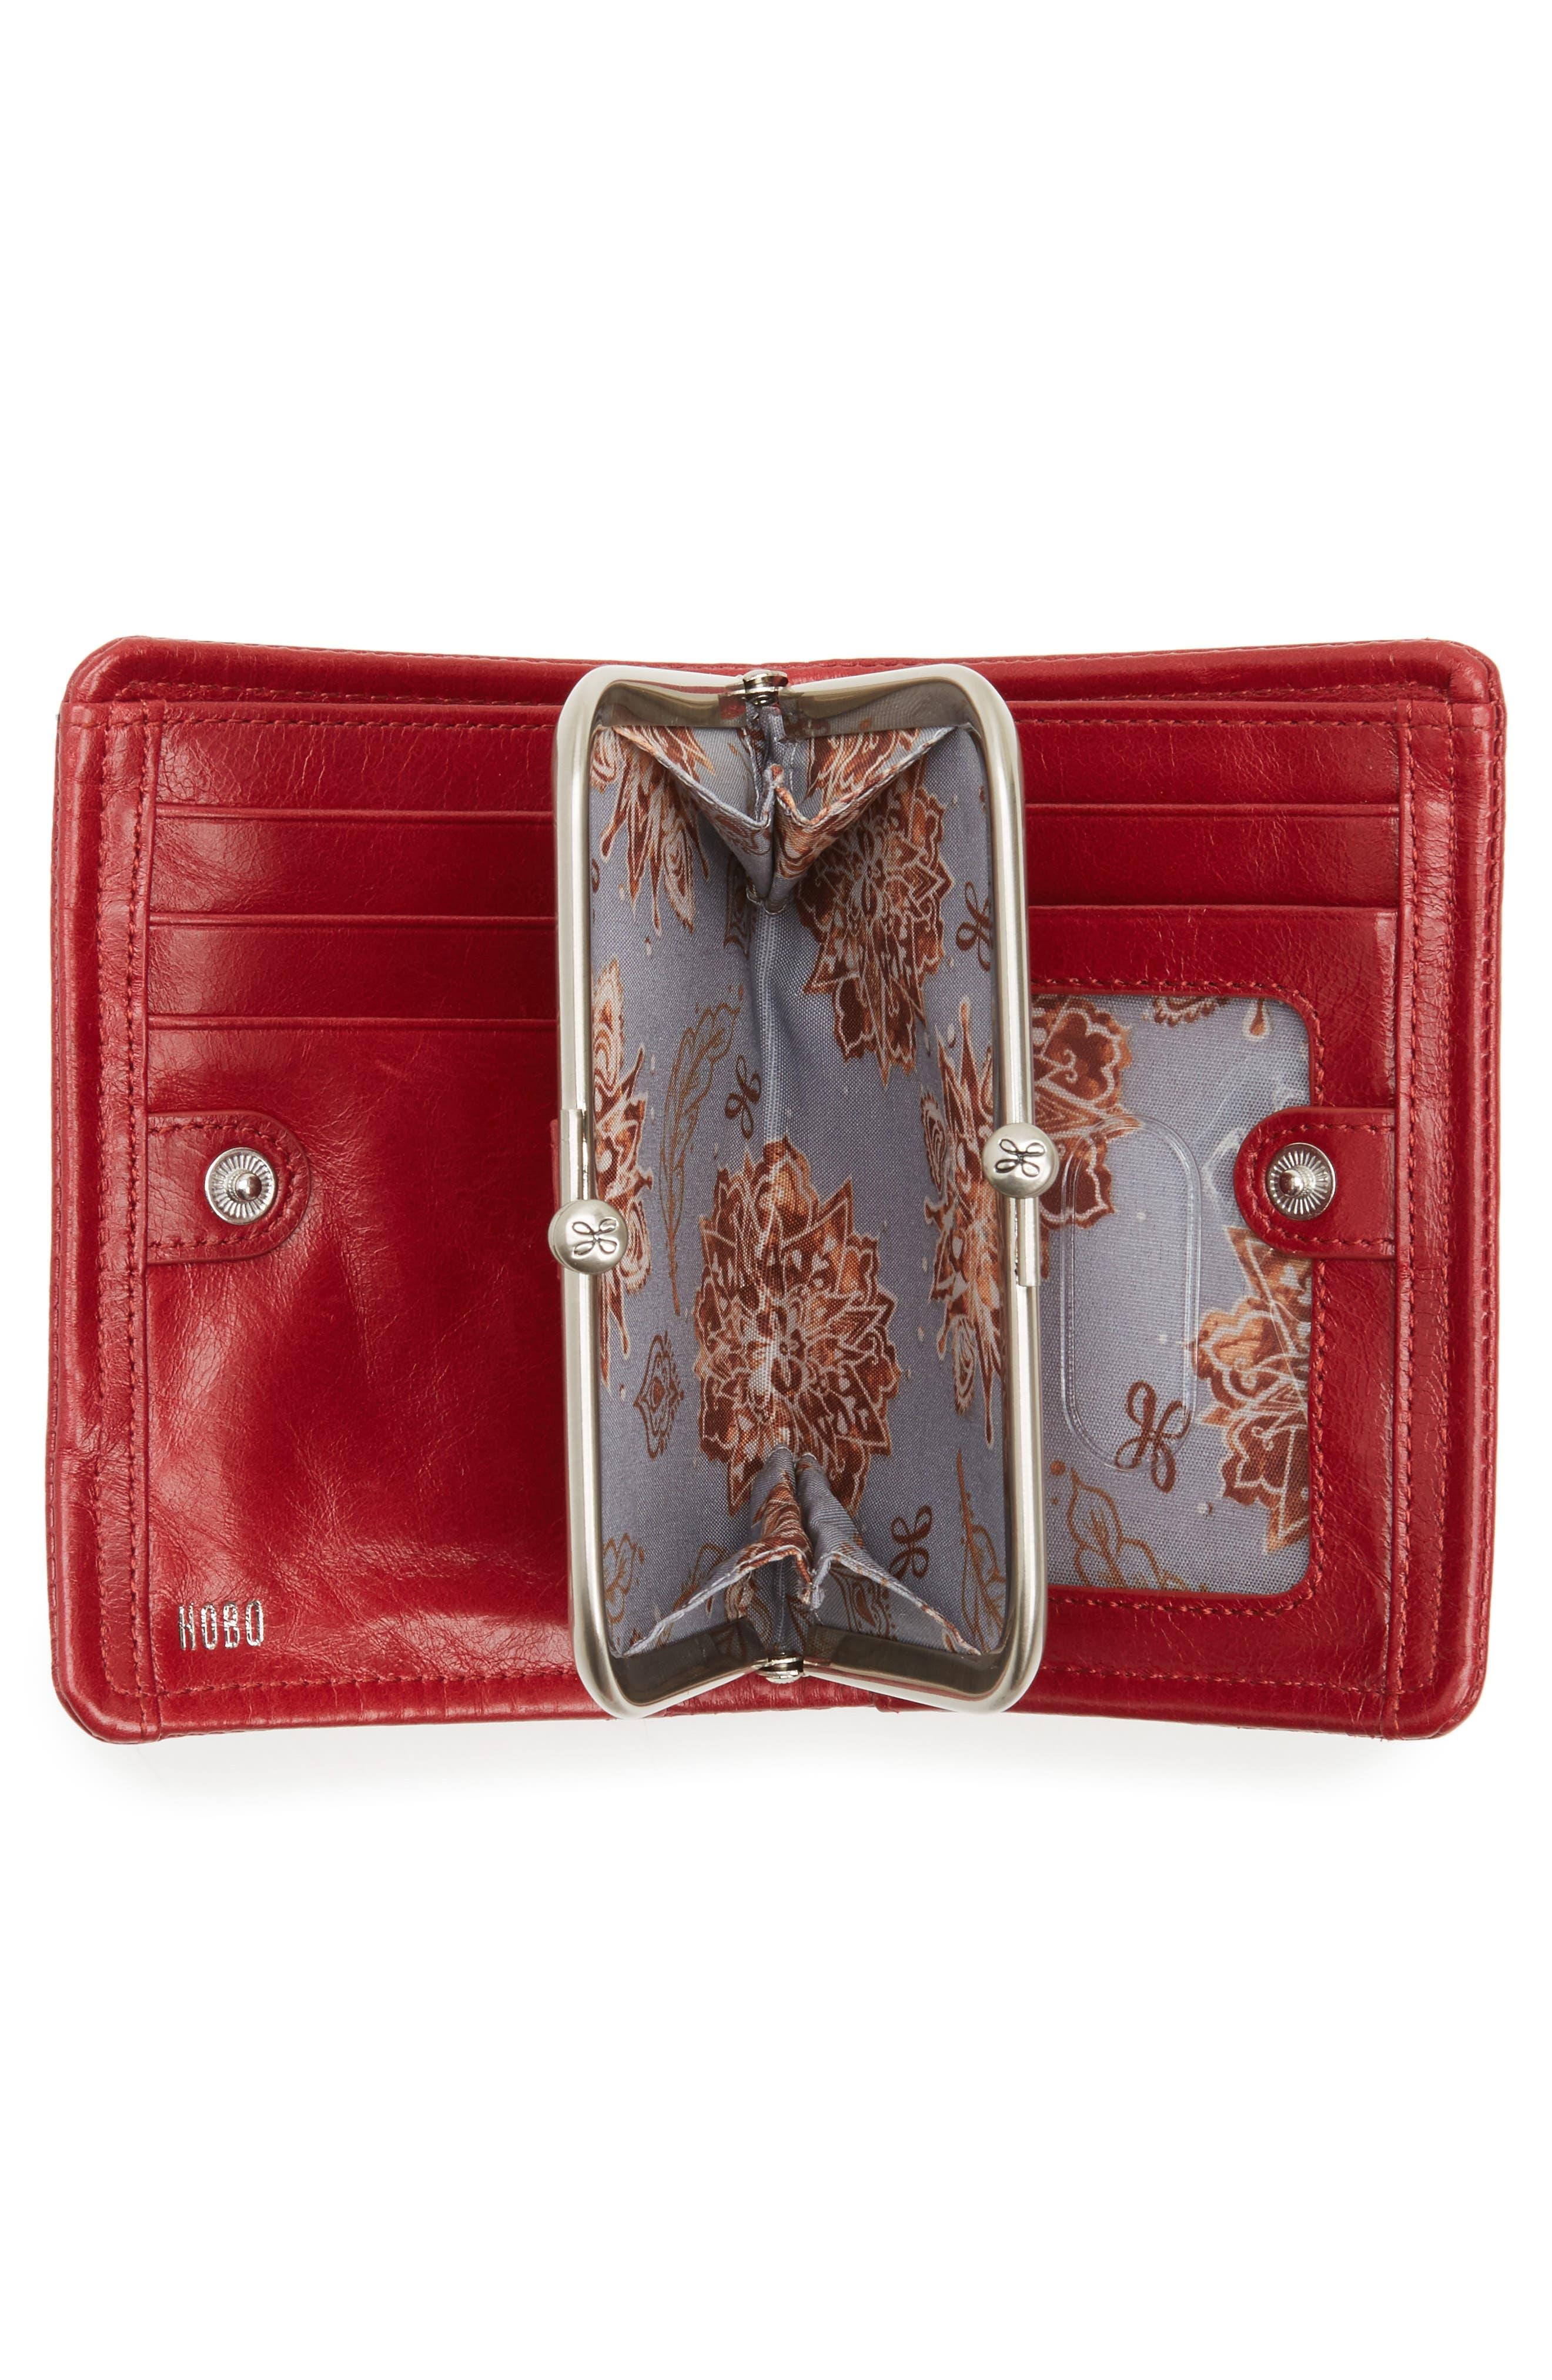 Delta Calfskin Leather Wallet,                             Alternate thumbnail 2, color,                             Cardinal